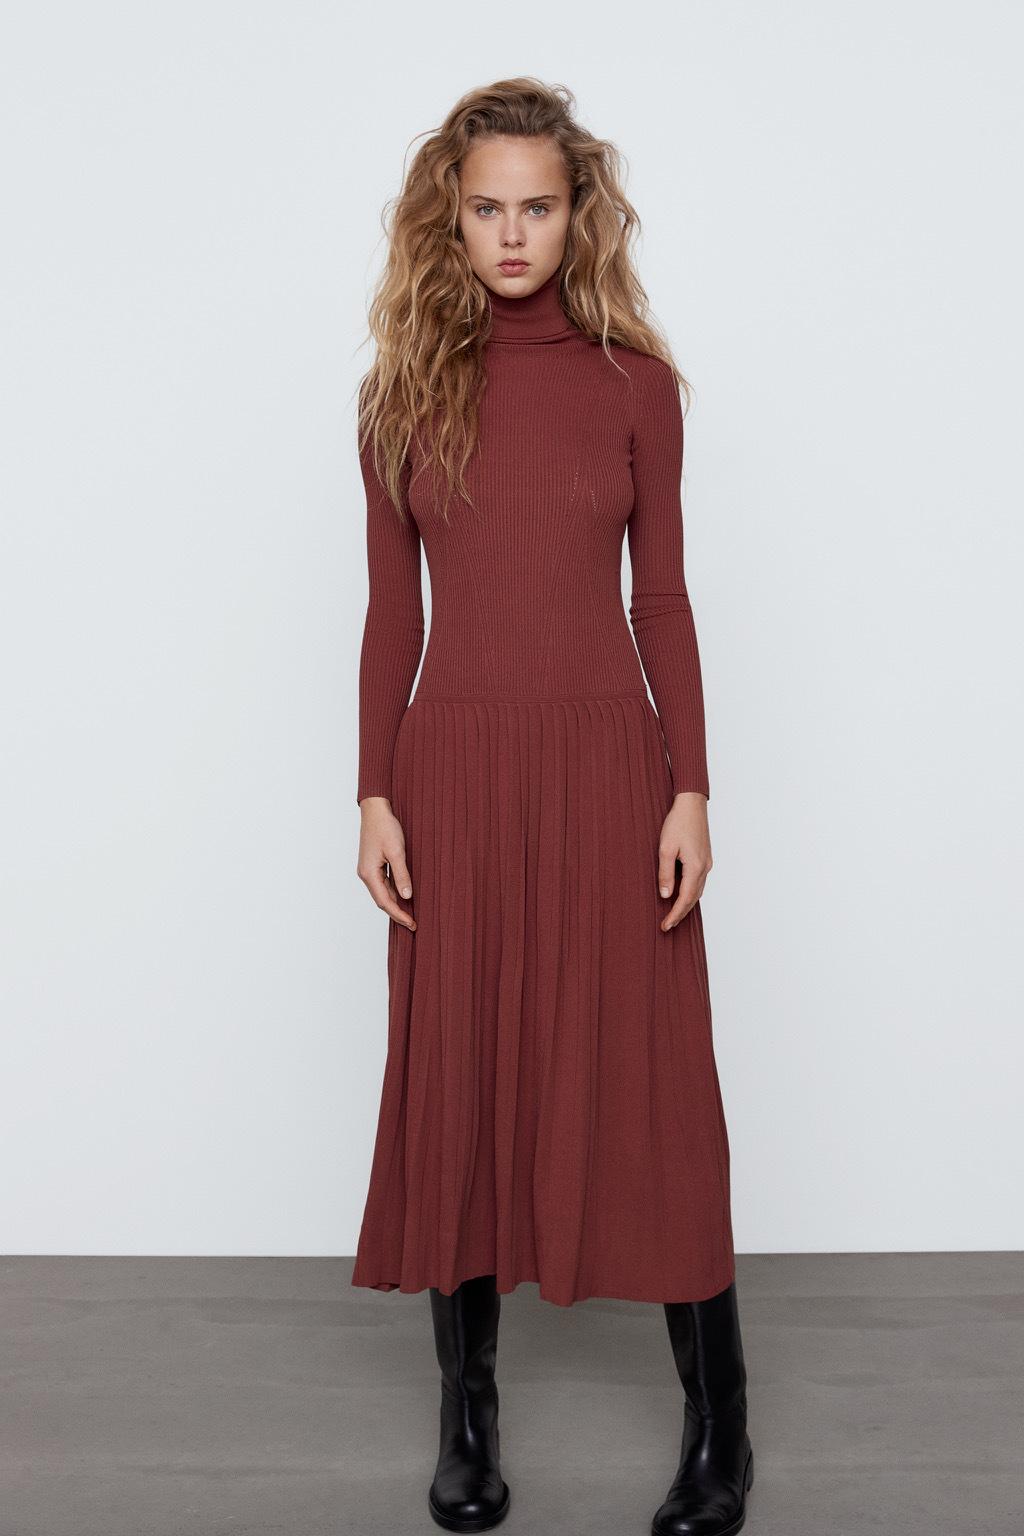 Vestido de lana de Zara.